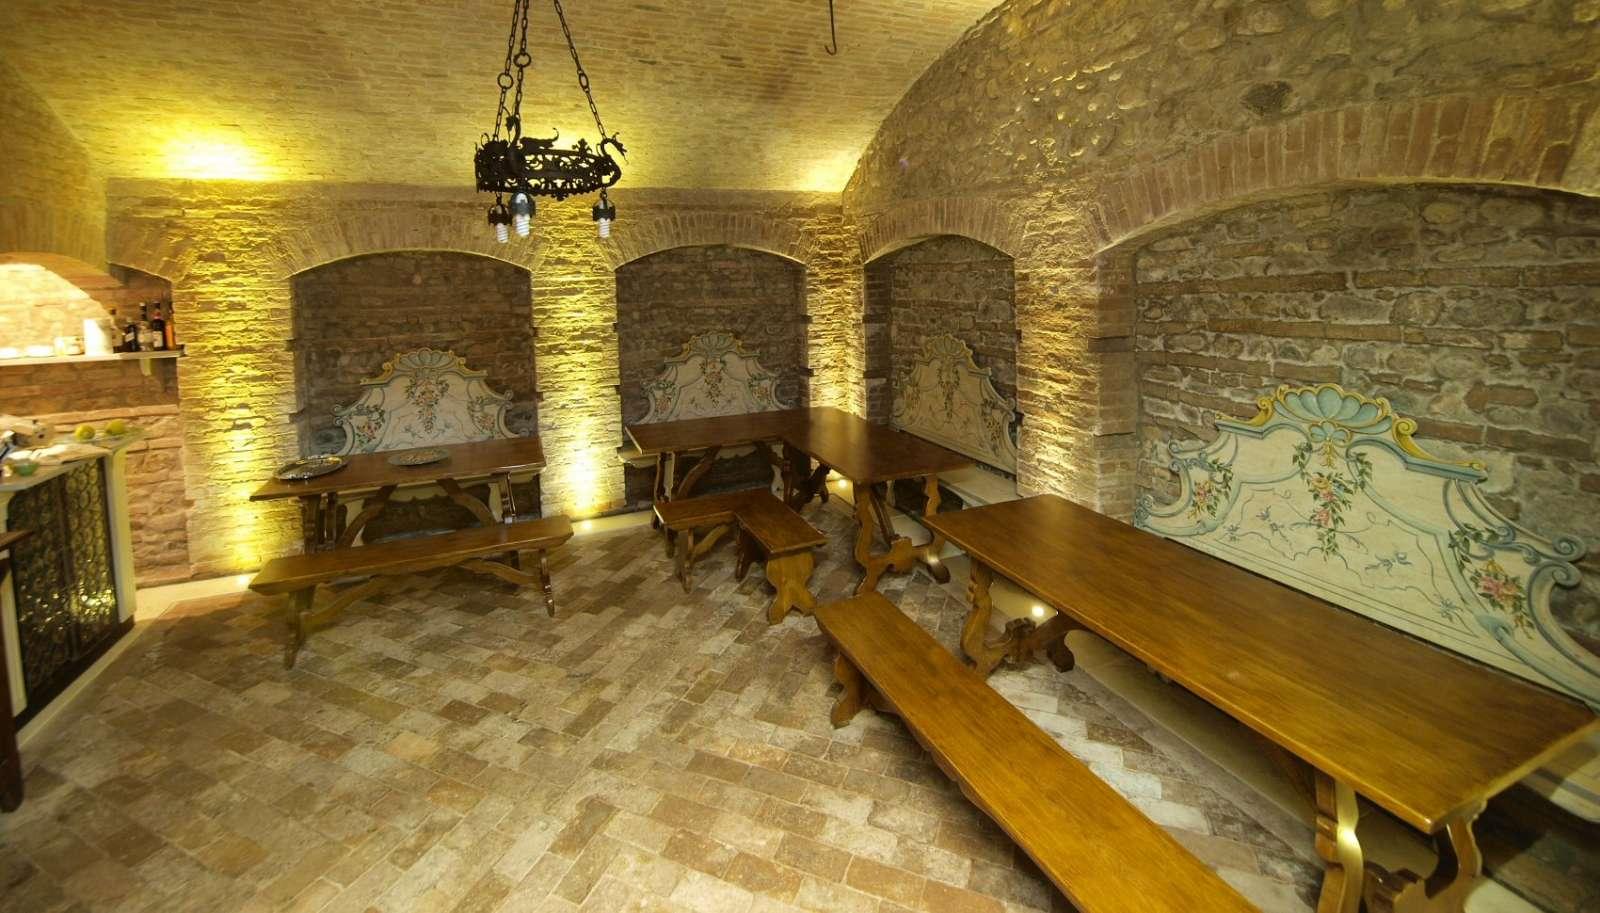 The historic breakfast room